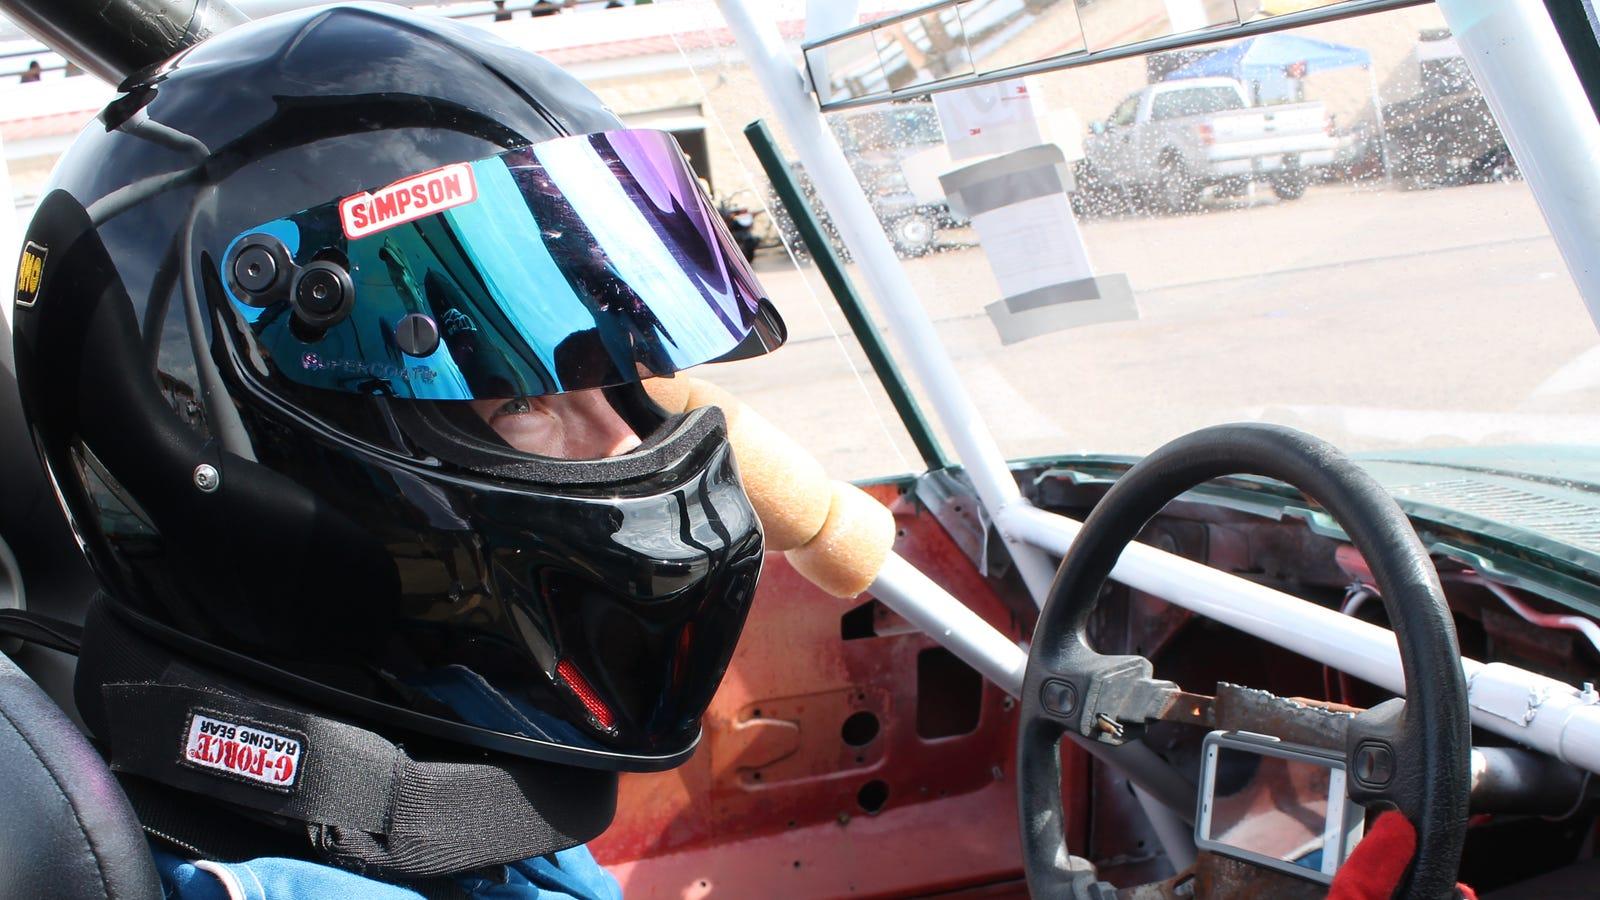 Driving gloves jalopnik - Driving Gloves Jalopnik 30